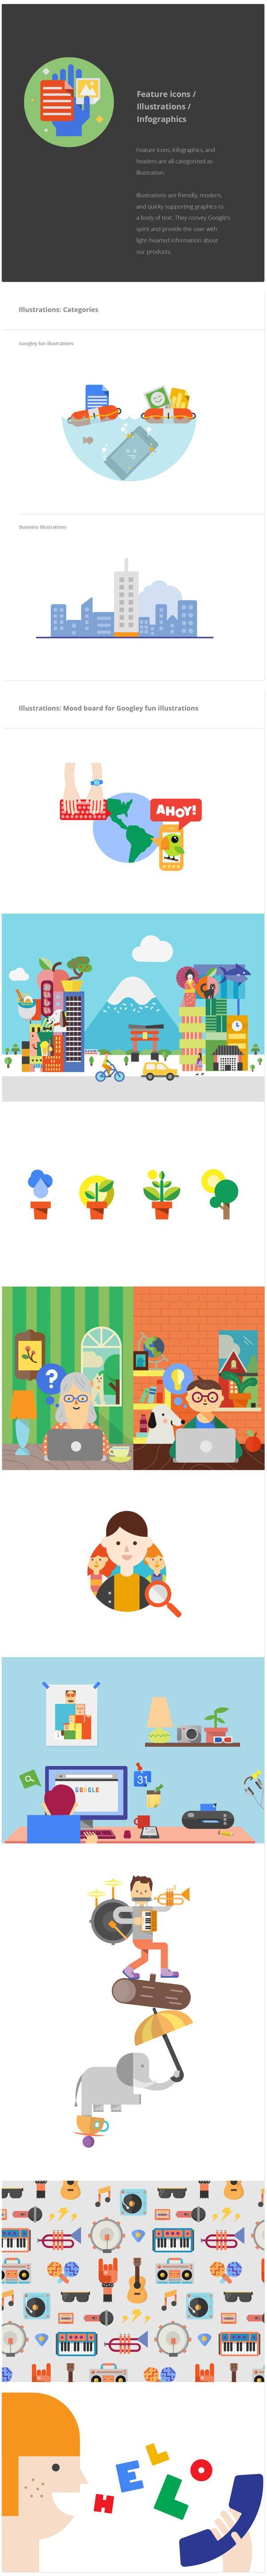 Google-Kurumsal-Kimlik-5